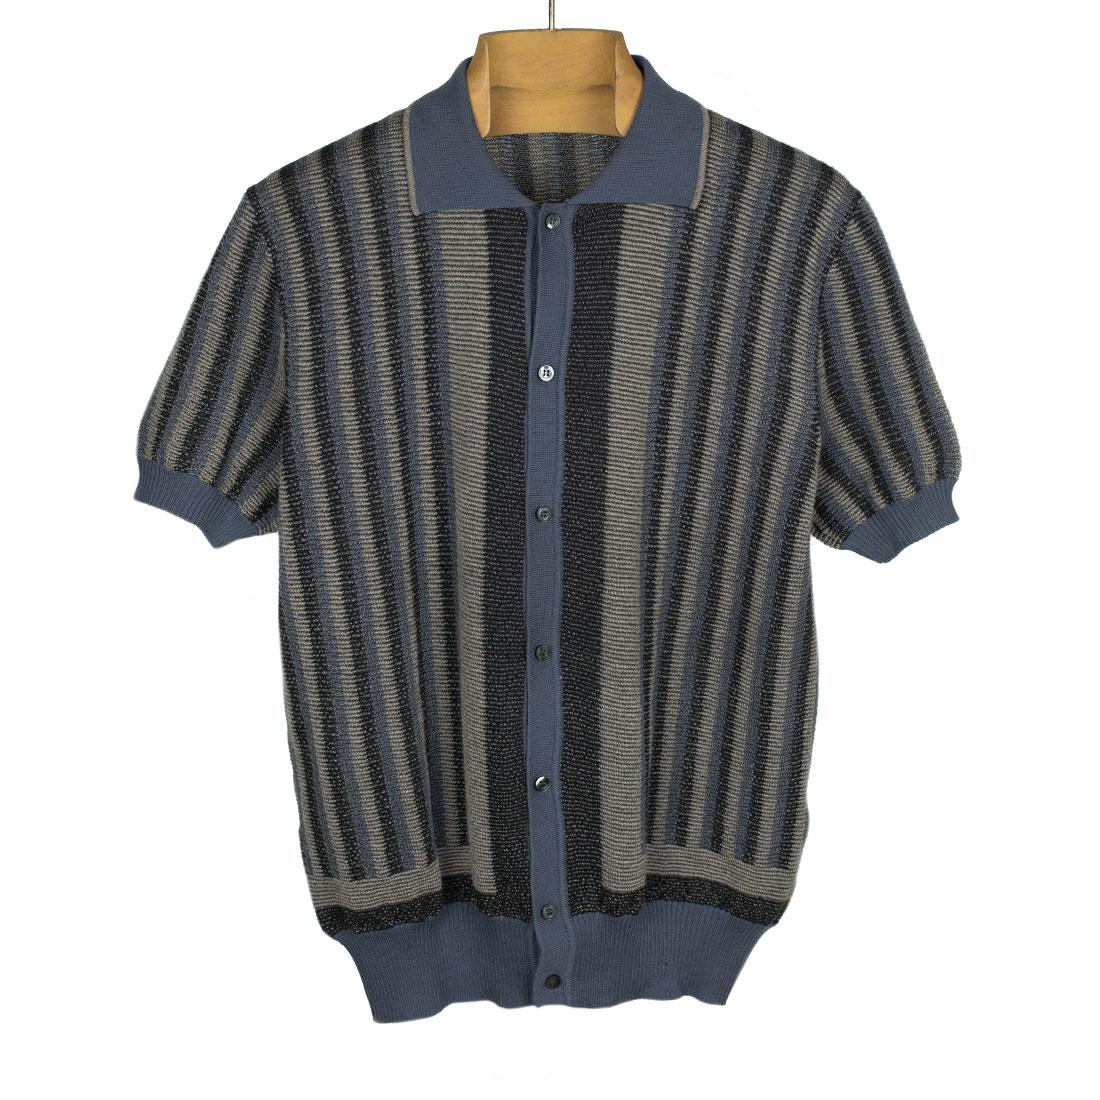 Kimber Ripley knit shirt (6).jpg